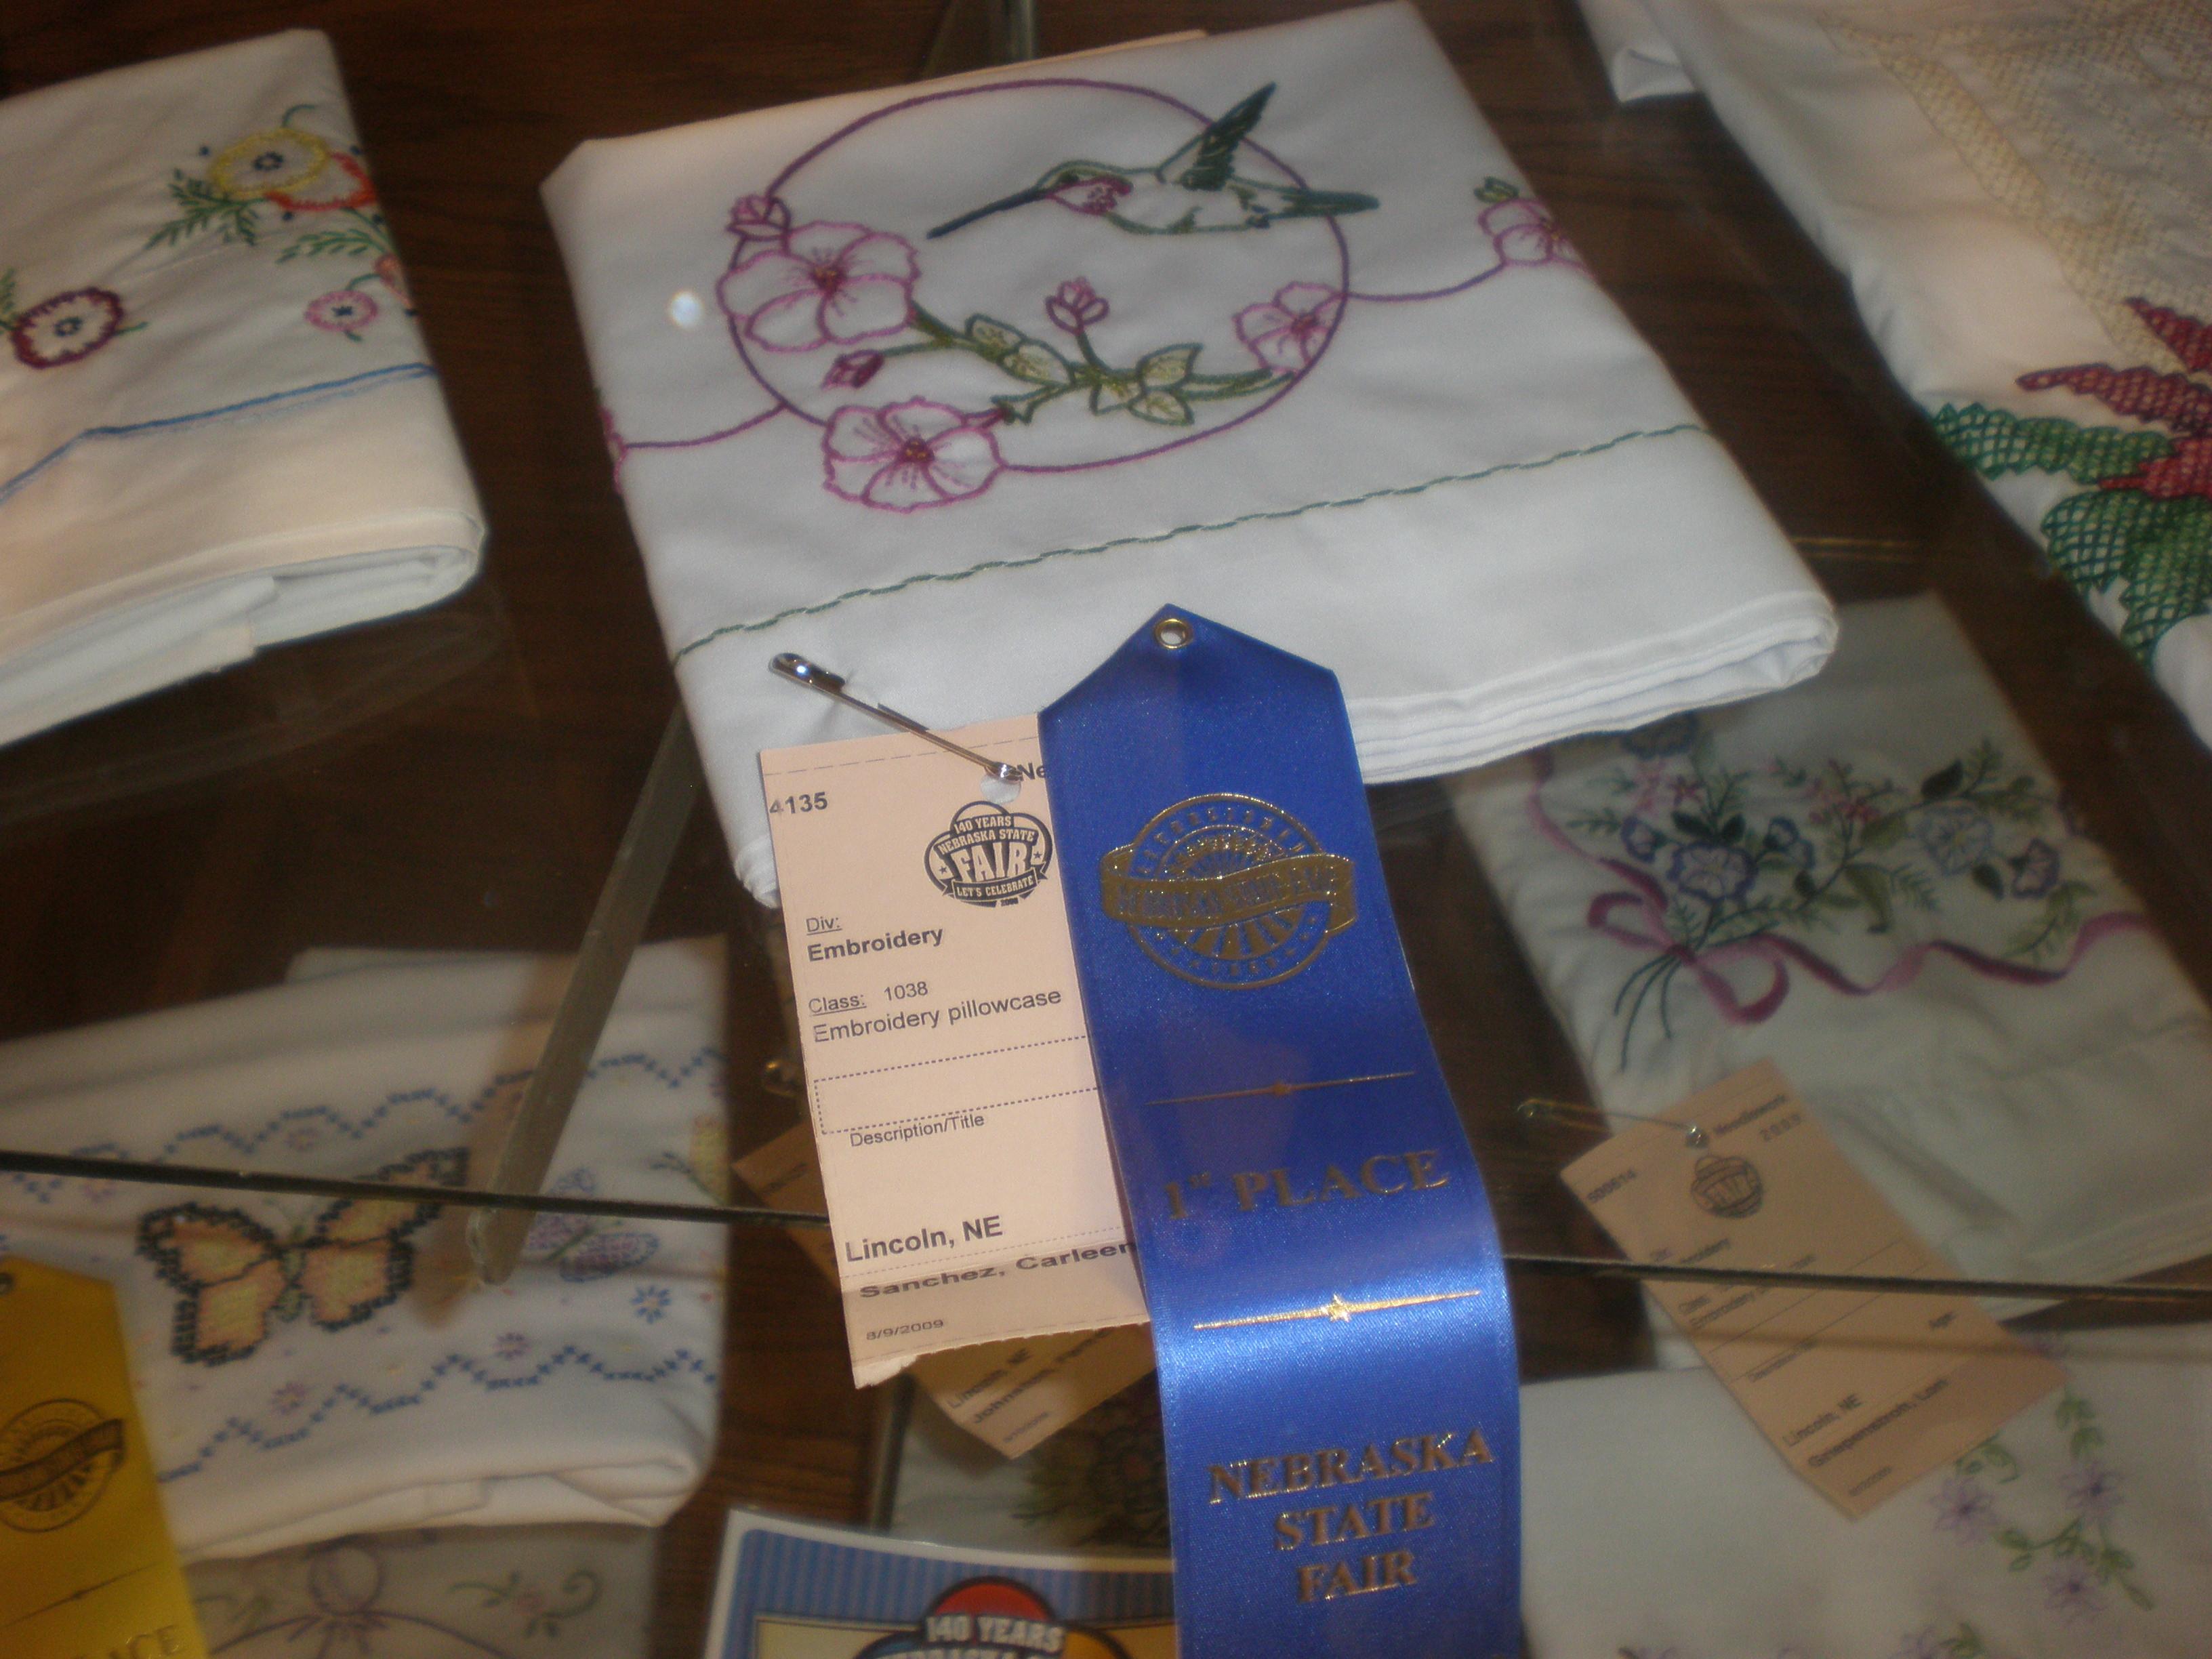 1st place pillow